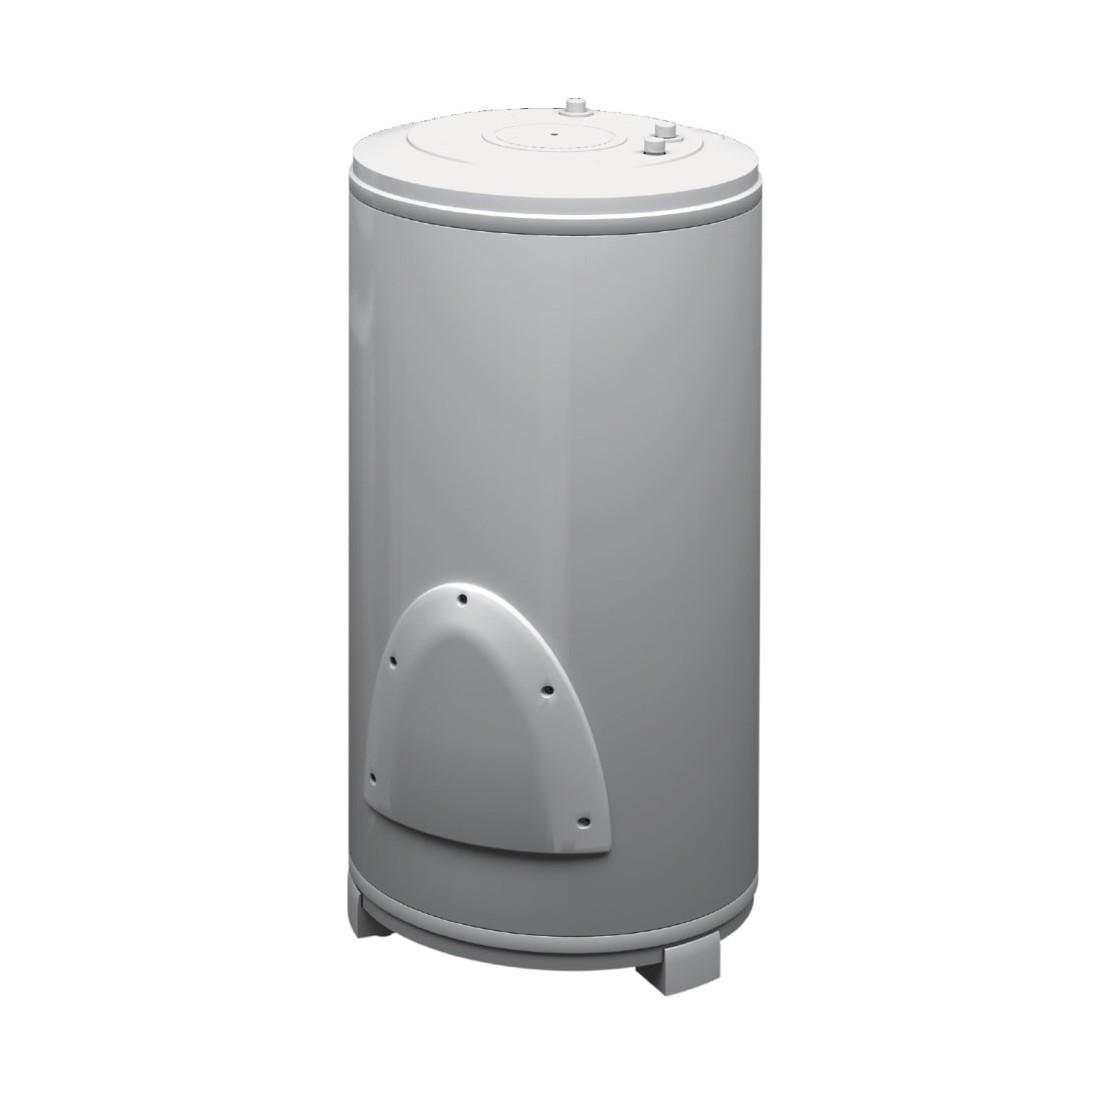 Šilumos siurblys Oras-Vanduo Ariston Nimbus, Flex, 110 S Net 16.74 kW Φ3, su 300 (286 l) vandens šildytuvu ir Wi-Fi